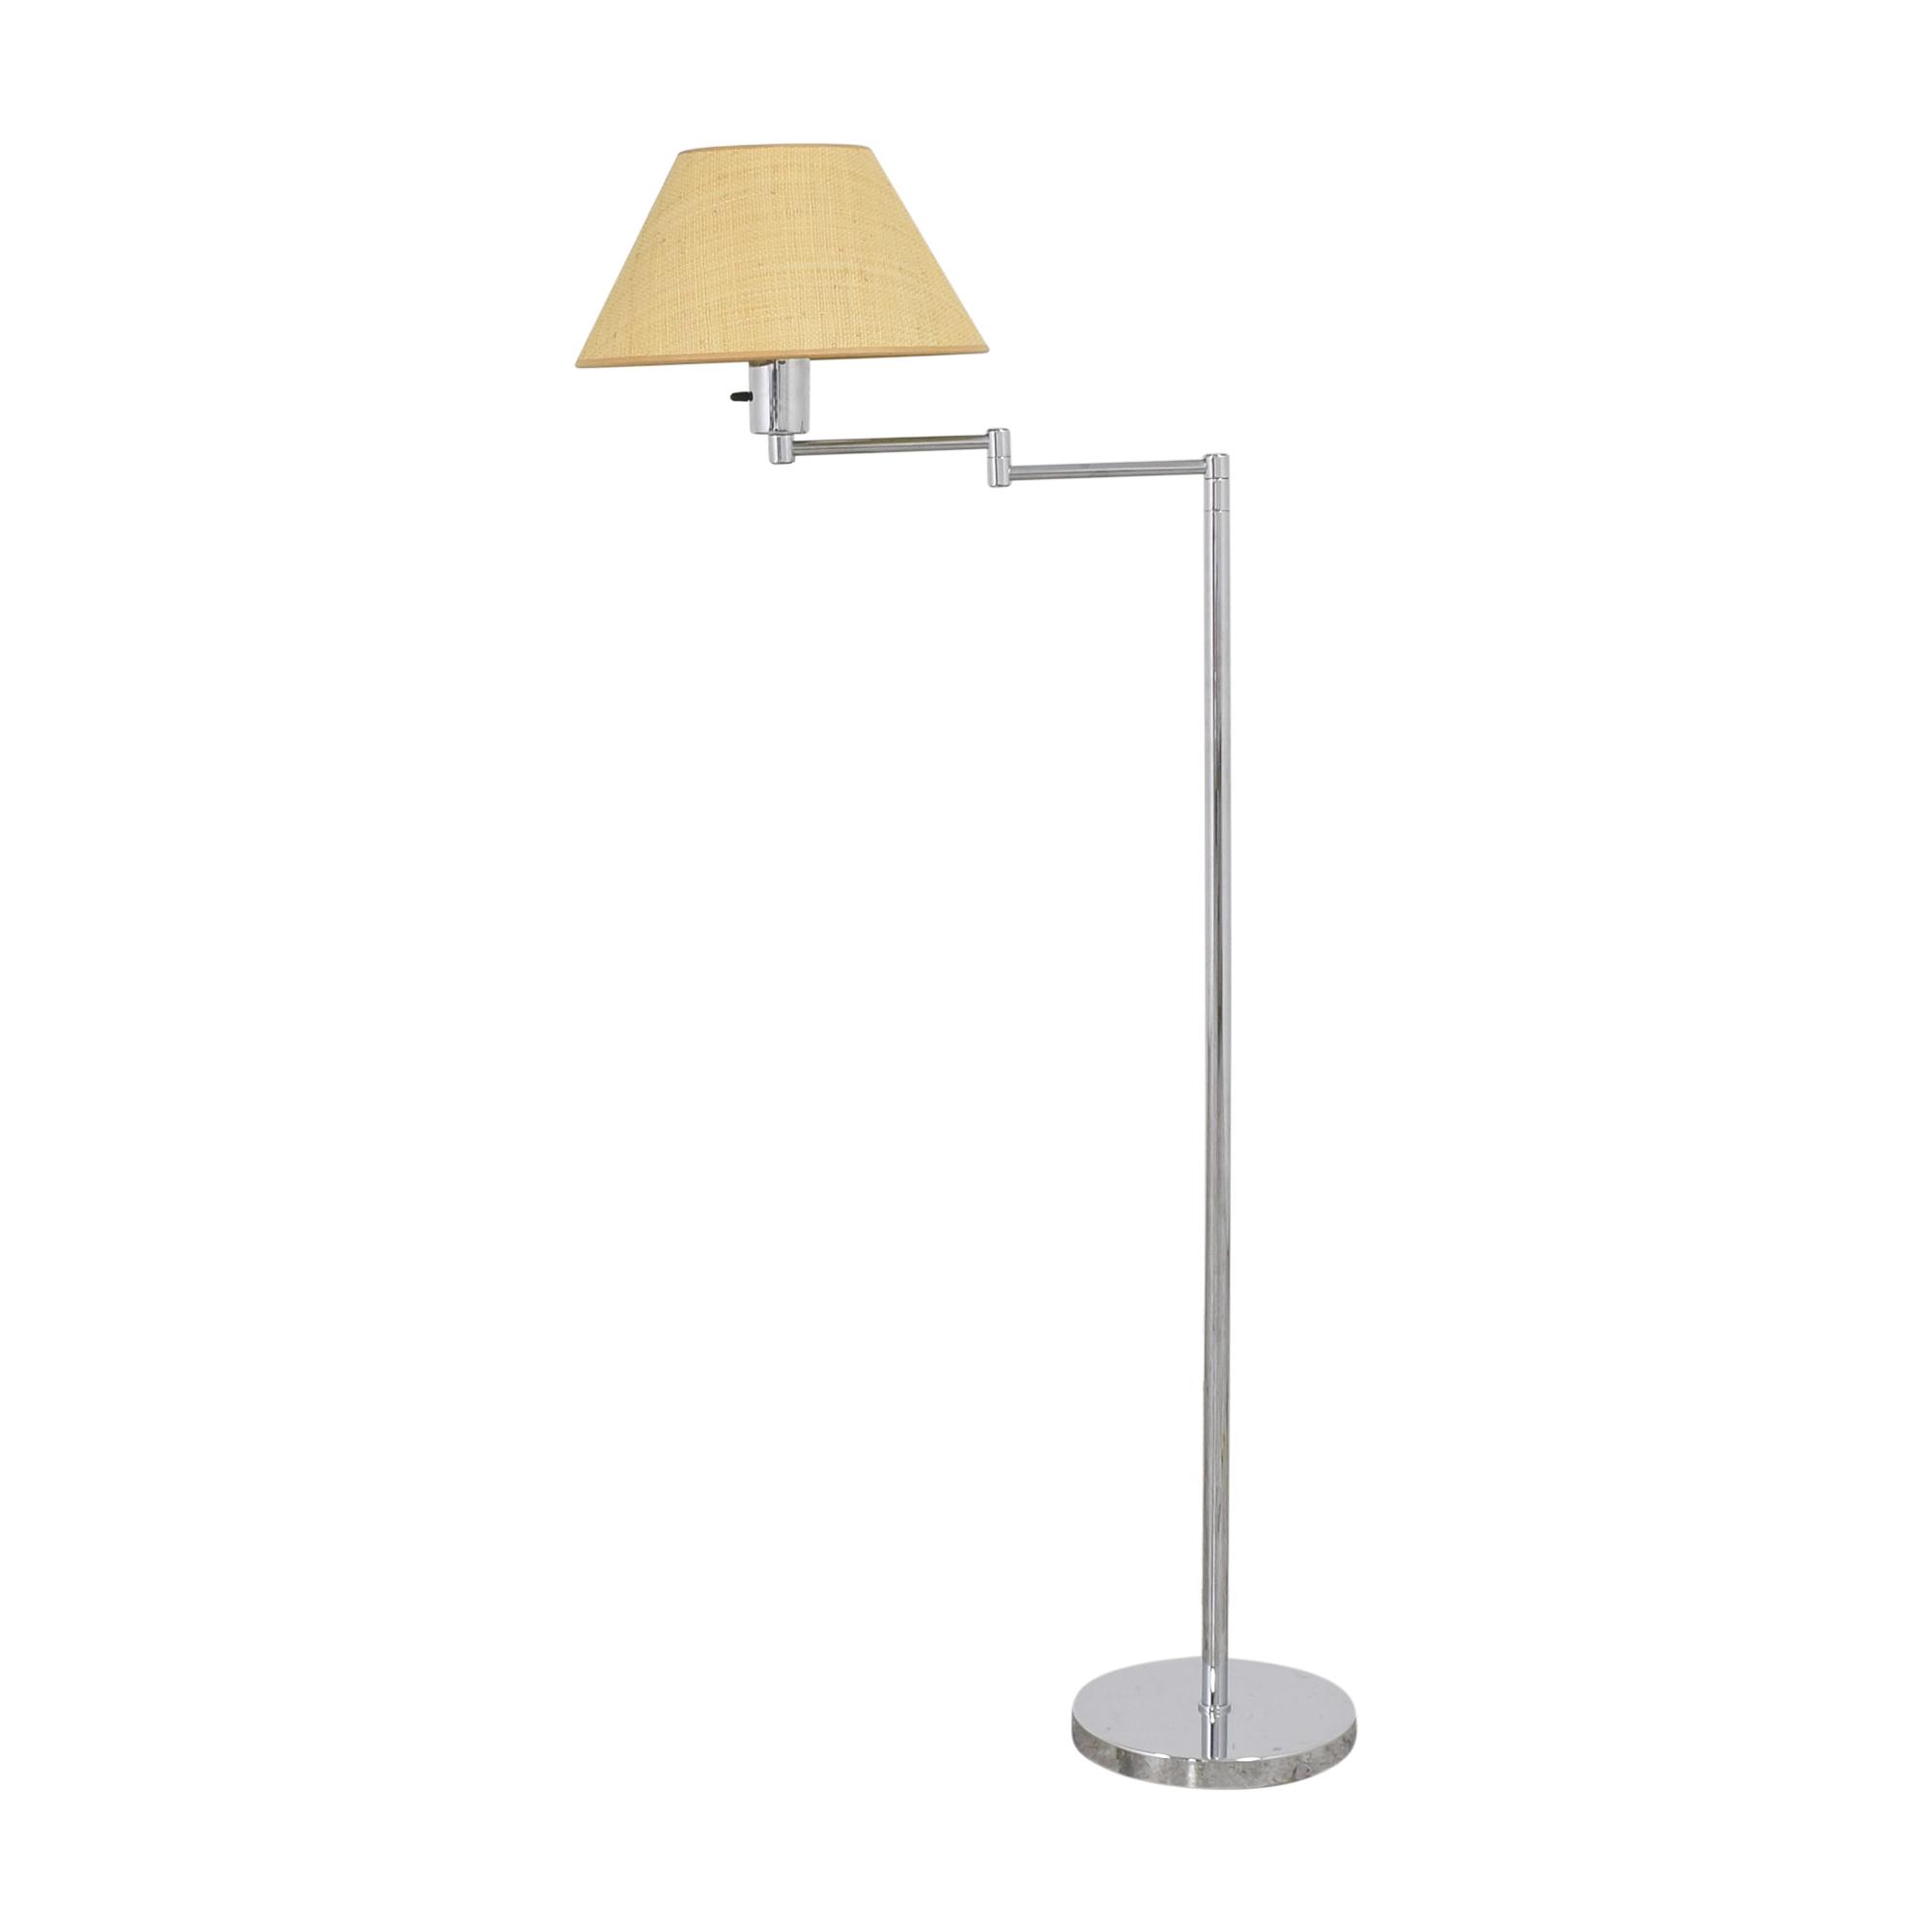 Scalamandre Scalamandre Hansen Double Swing Arm Floor Lamp nyc